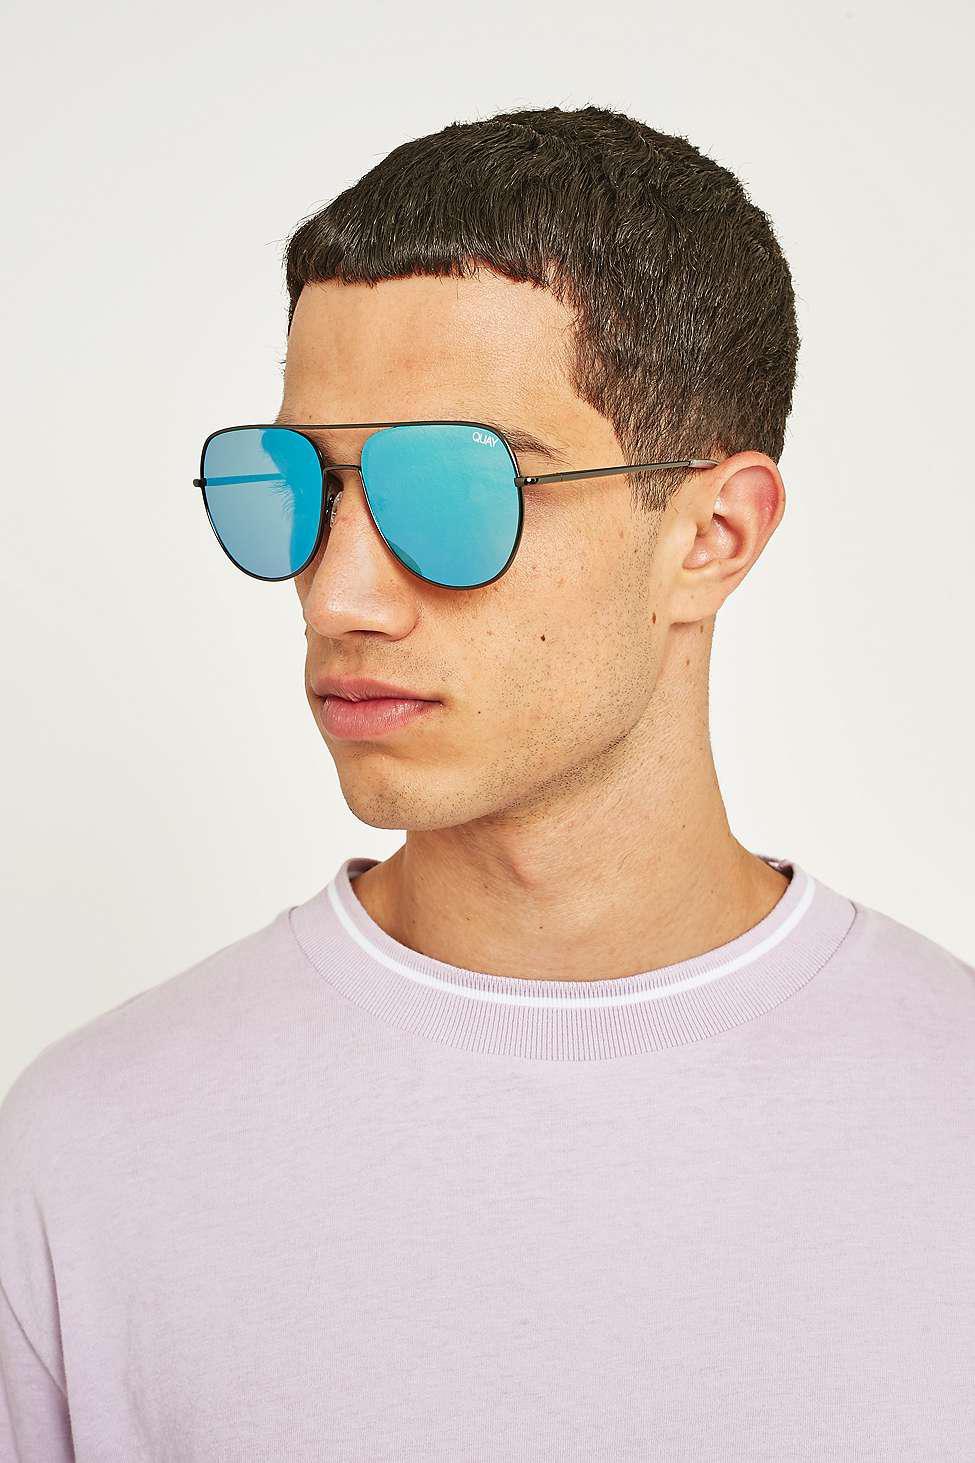 19d80cfefe6 Quay Living Large Blue Lens Sunglasses - Mens All in Gray for Men - Lyst